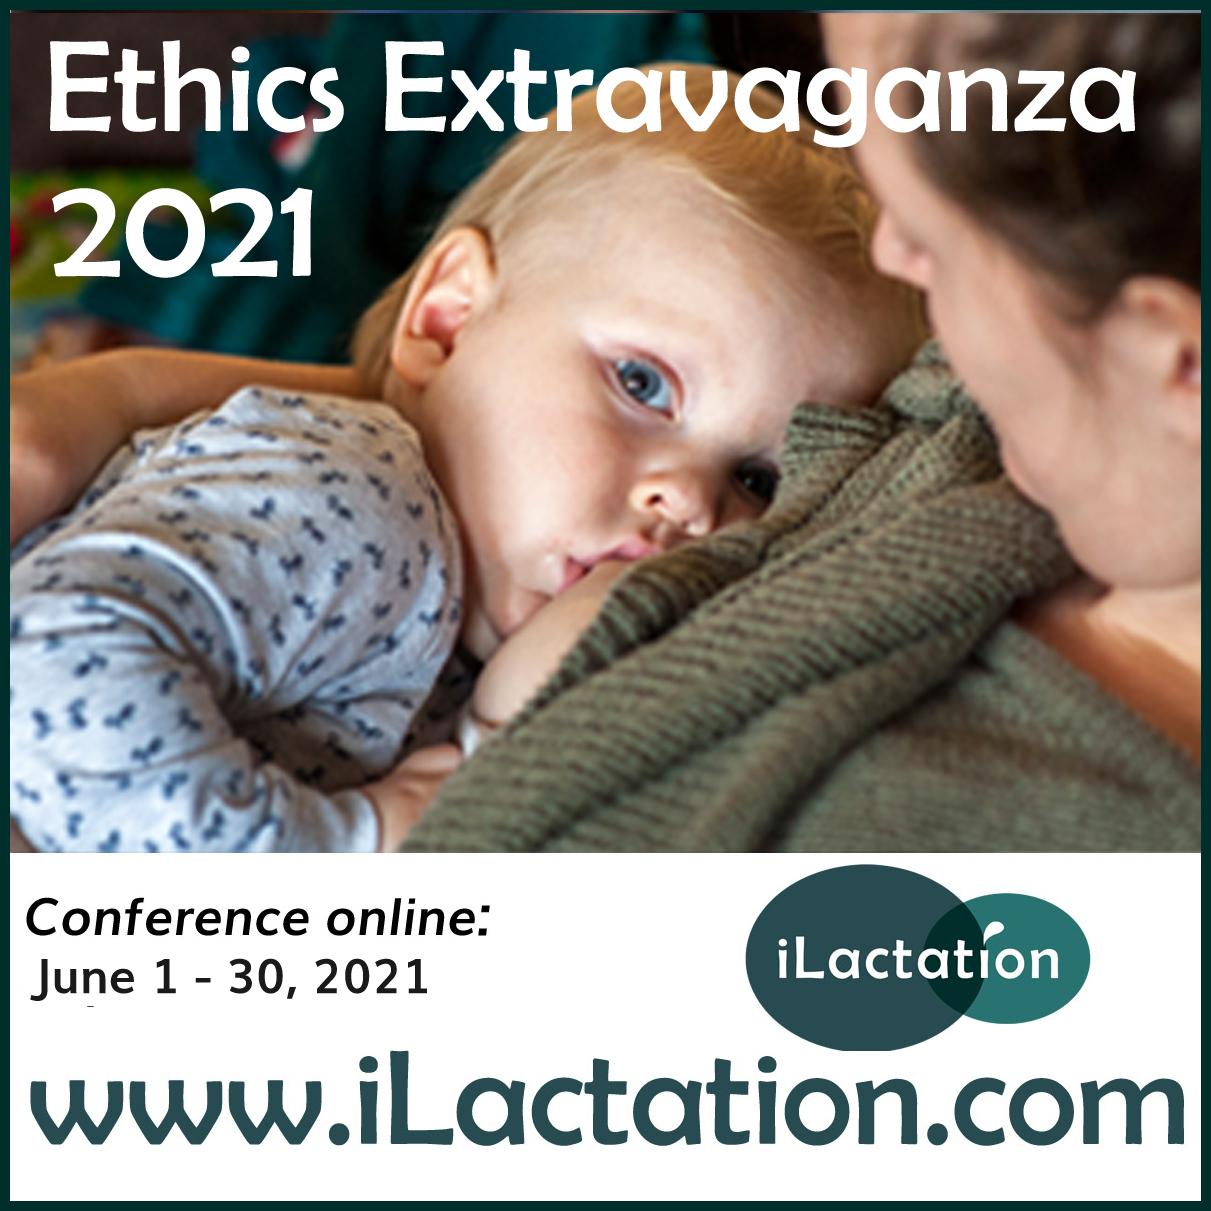 Insta picture - Ethics Extravaganza 2021